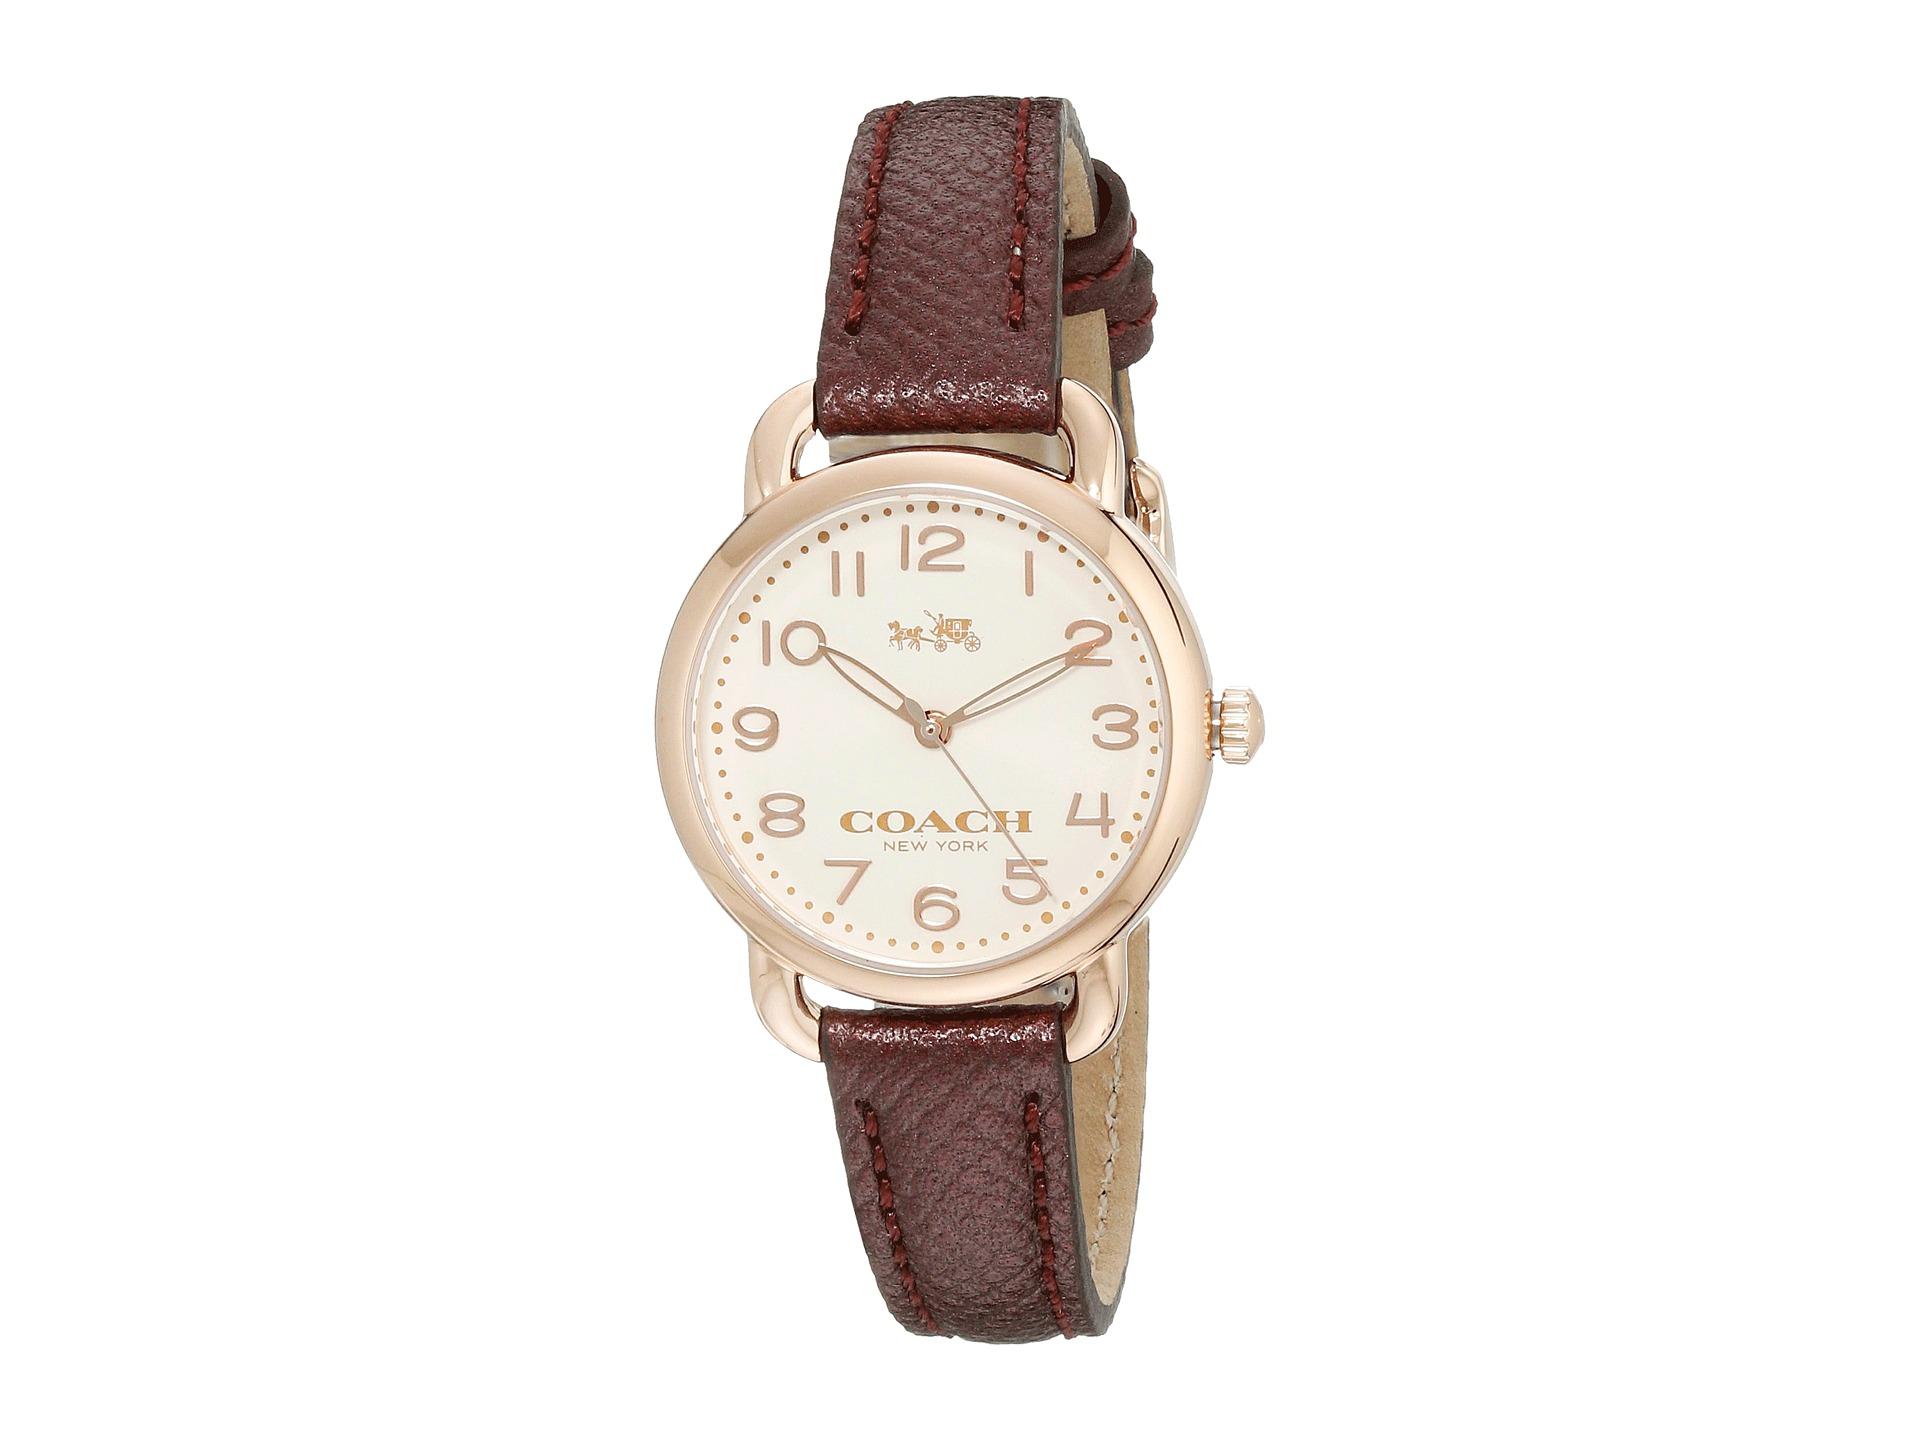 Lyst - Coach Delancey 28mm Leather Strap Watch in White